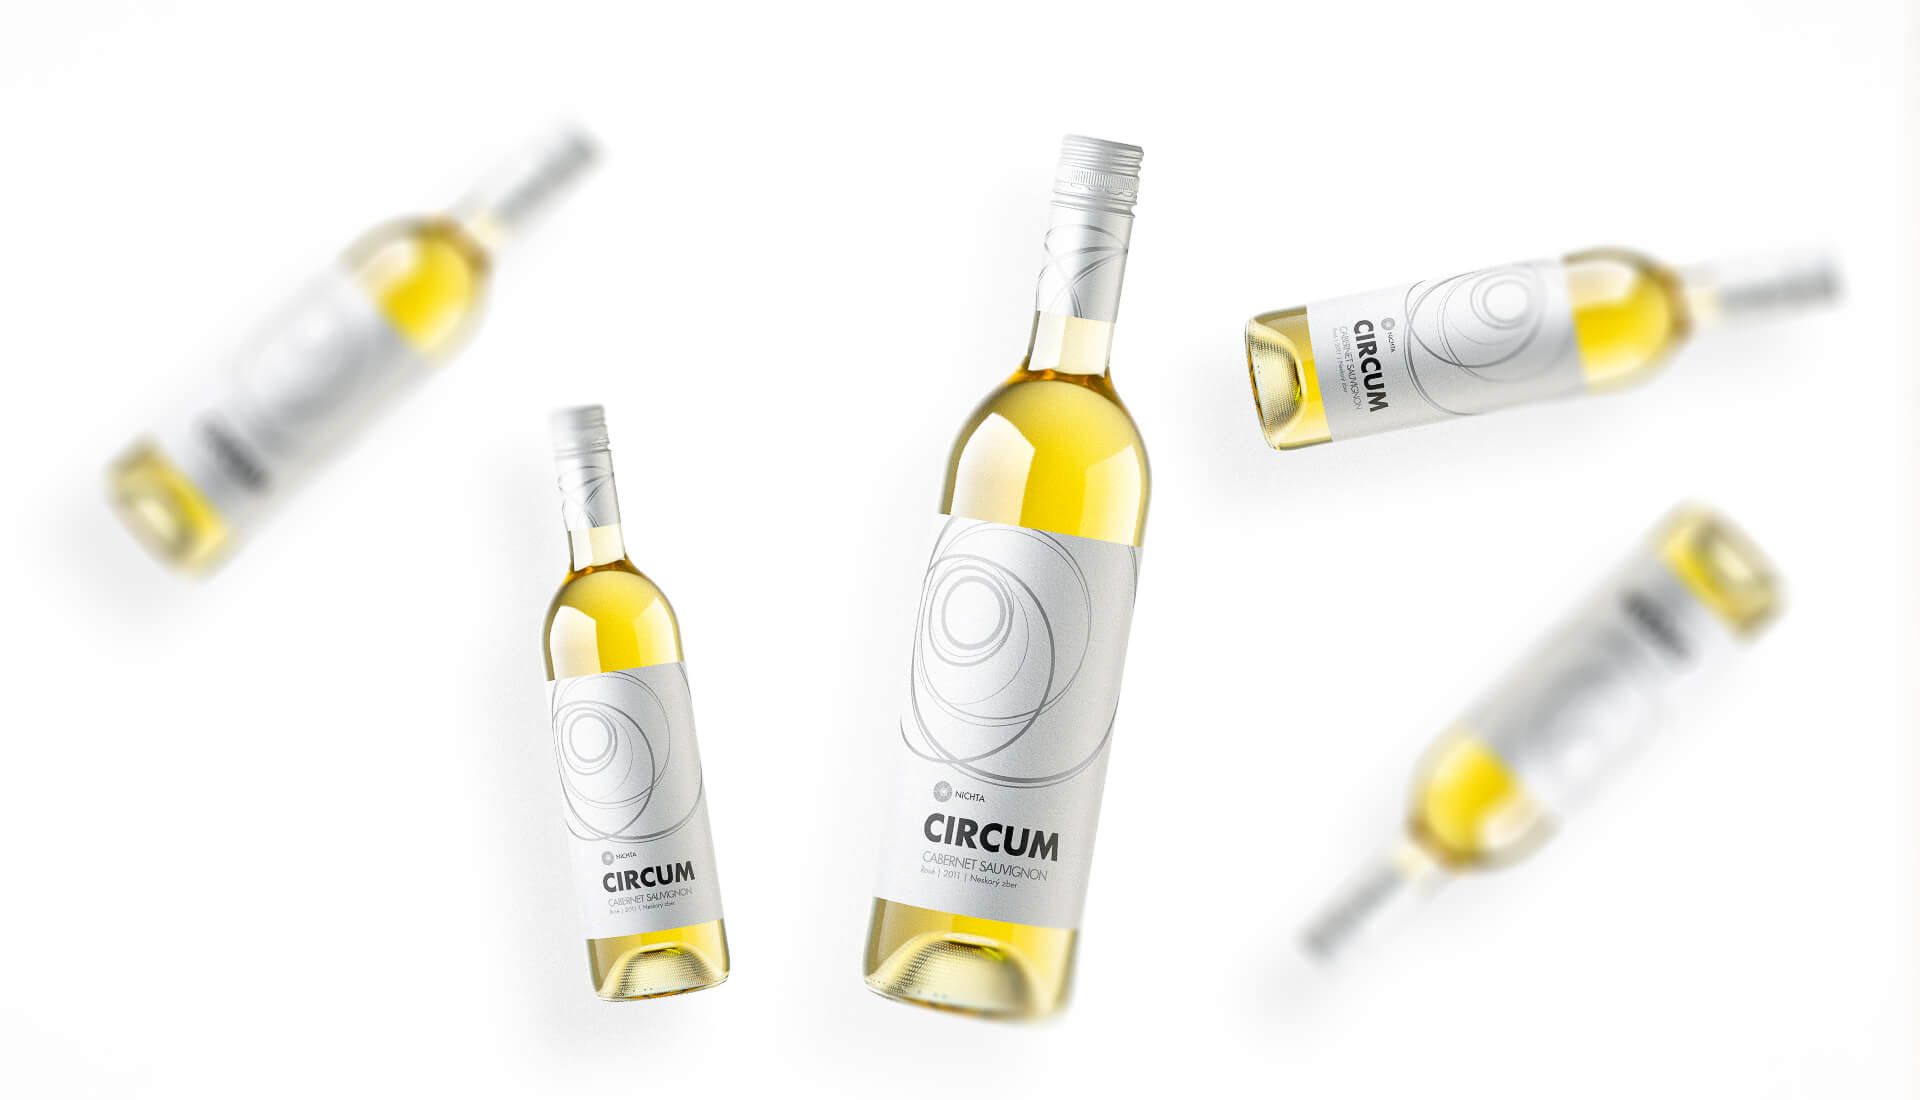 Wine label packaging design CIRCUM NICHTA winery white wine